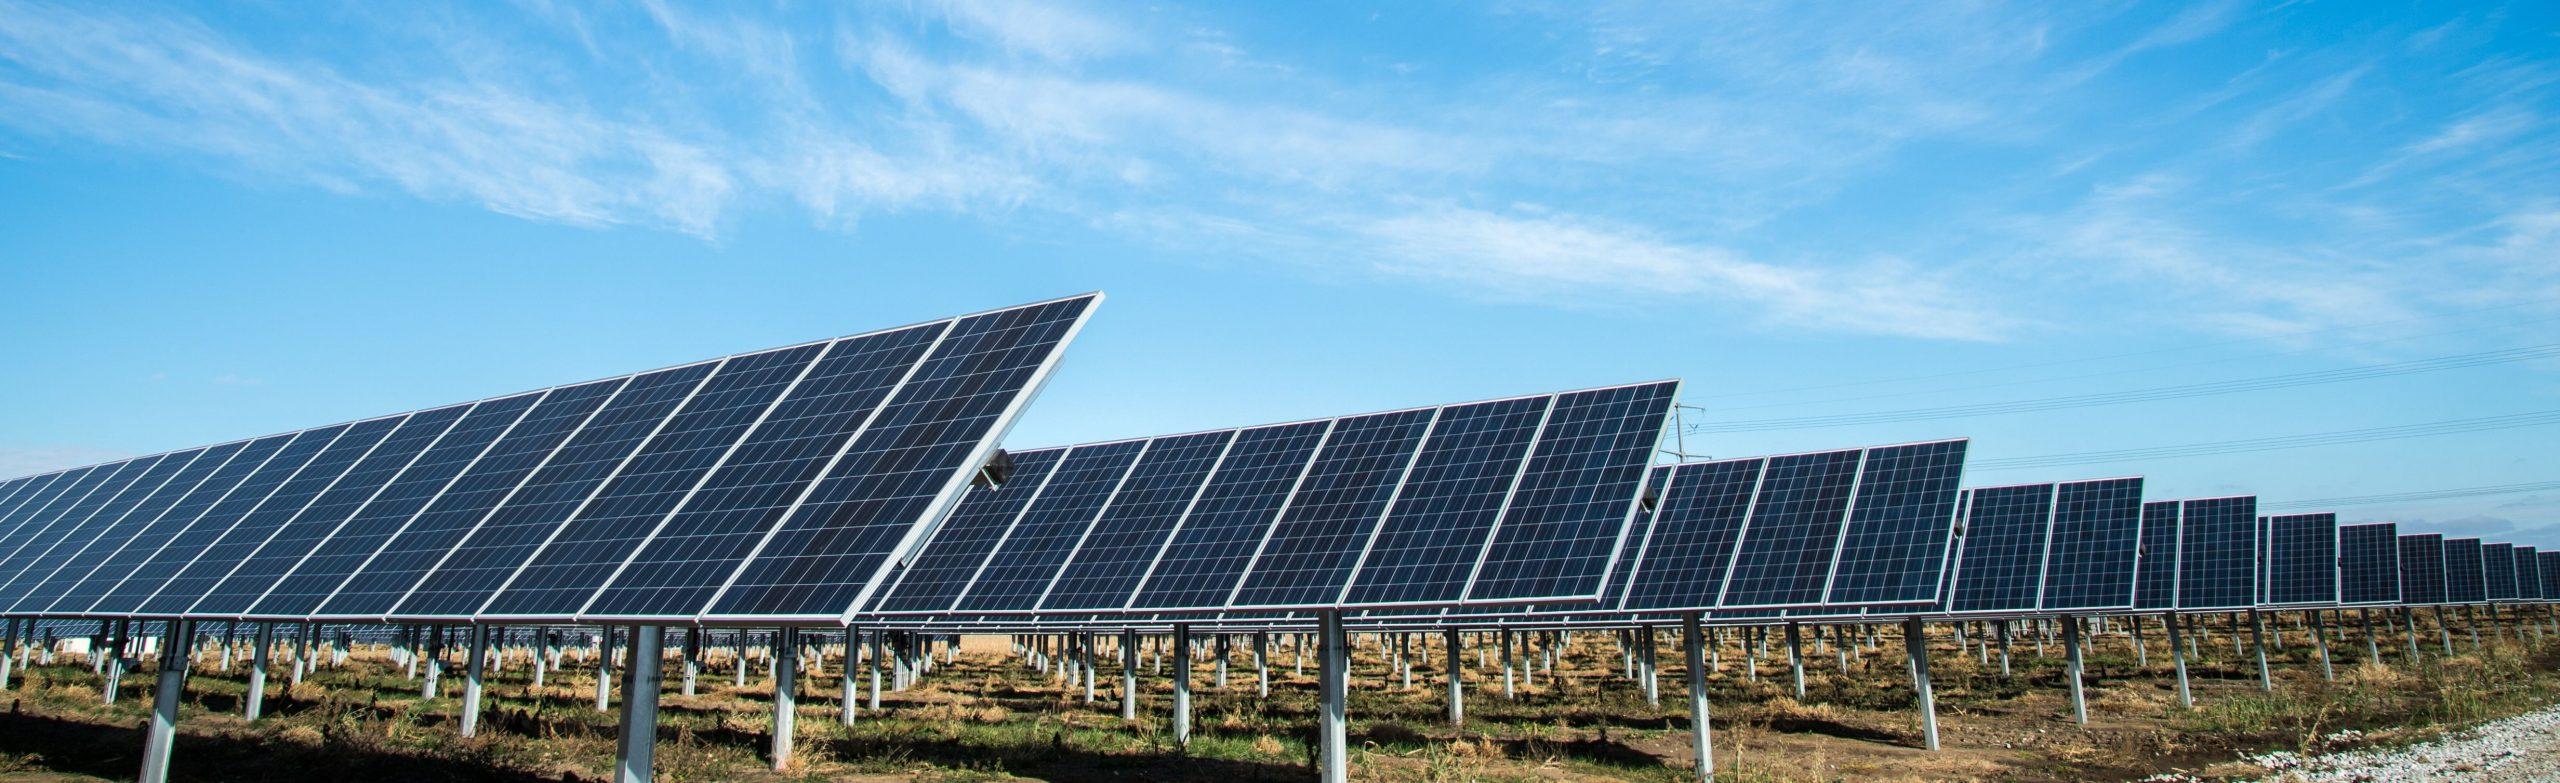 AleaSoft - Paneles solares energias renovables